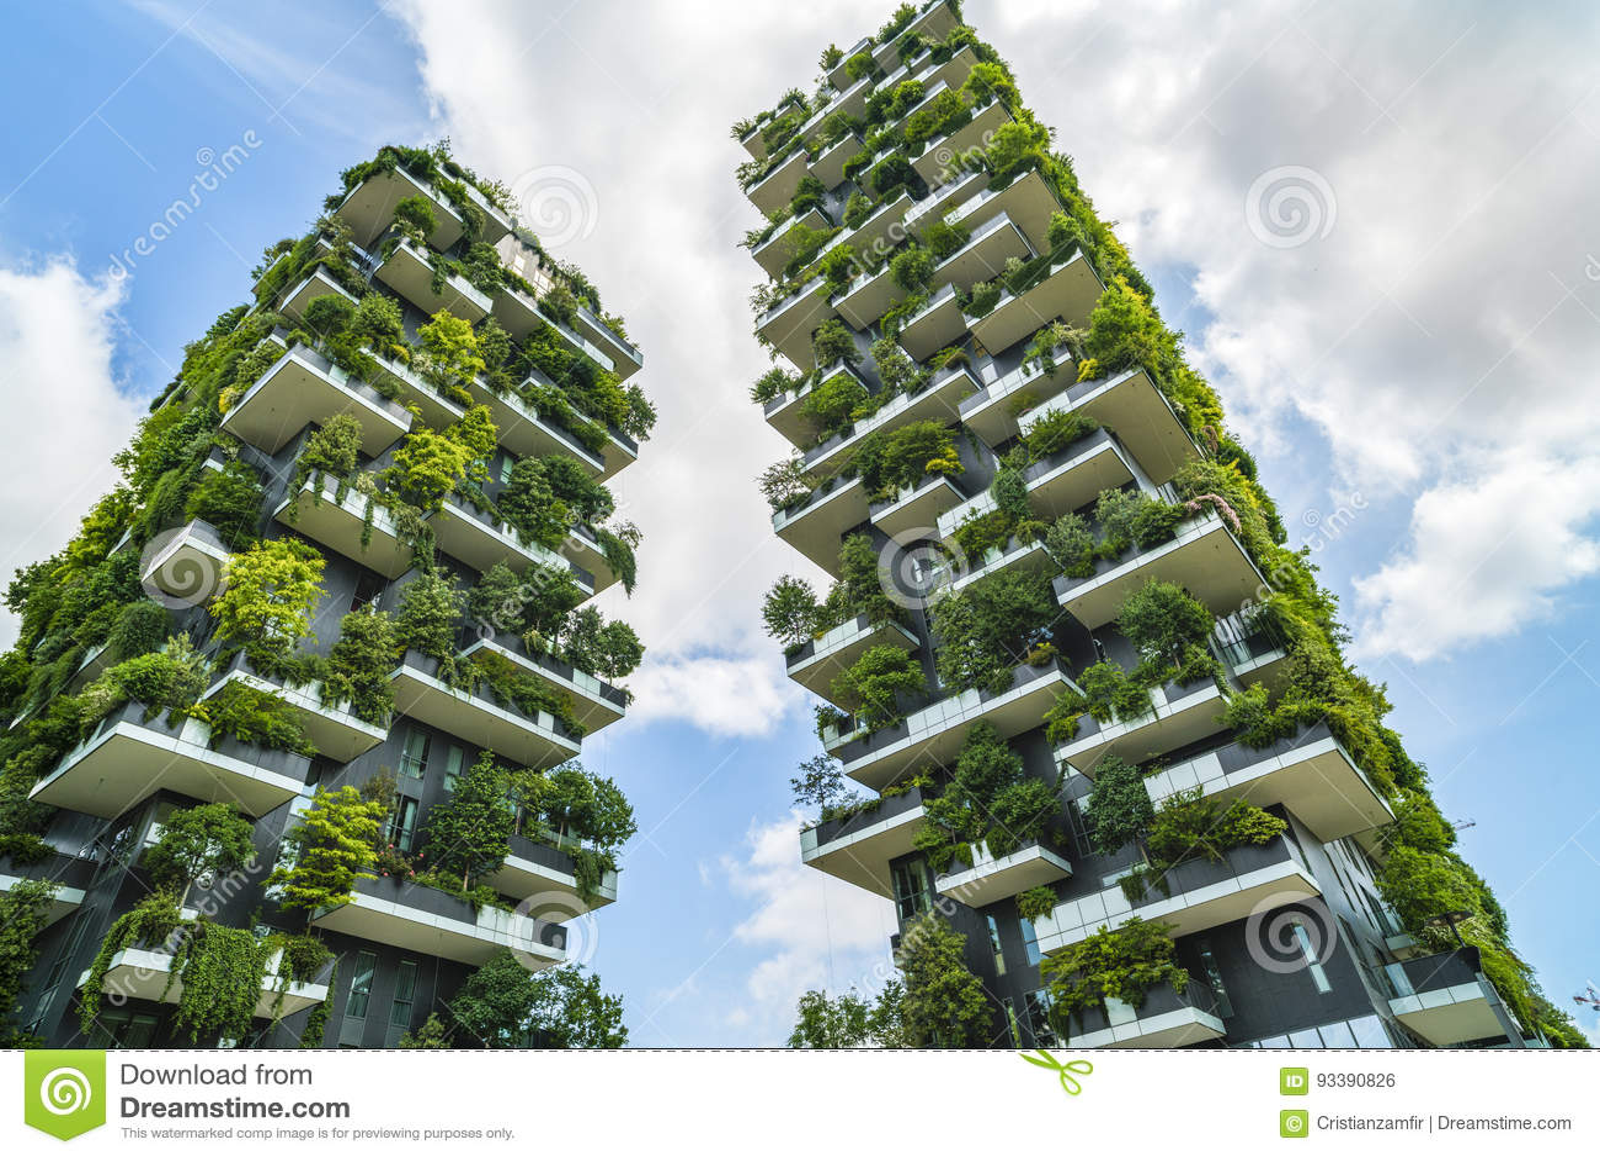 Milan Italy May 28 2017 Bosco Verticale Vertical